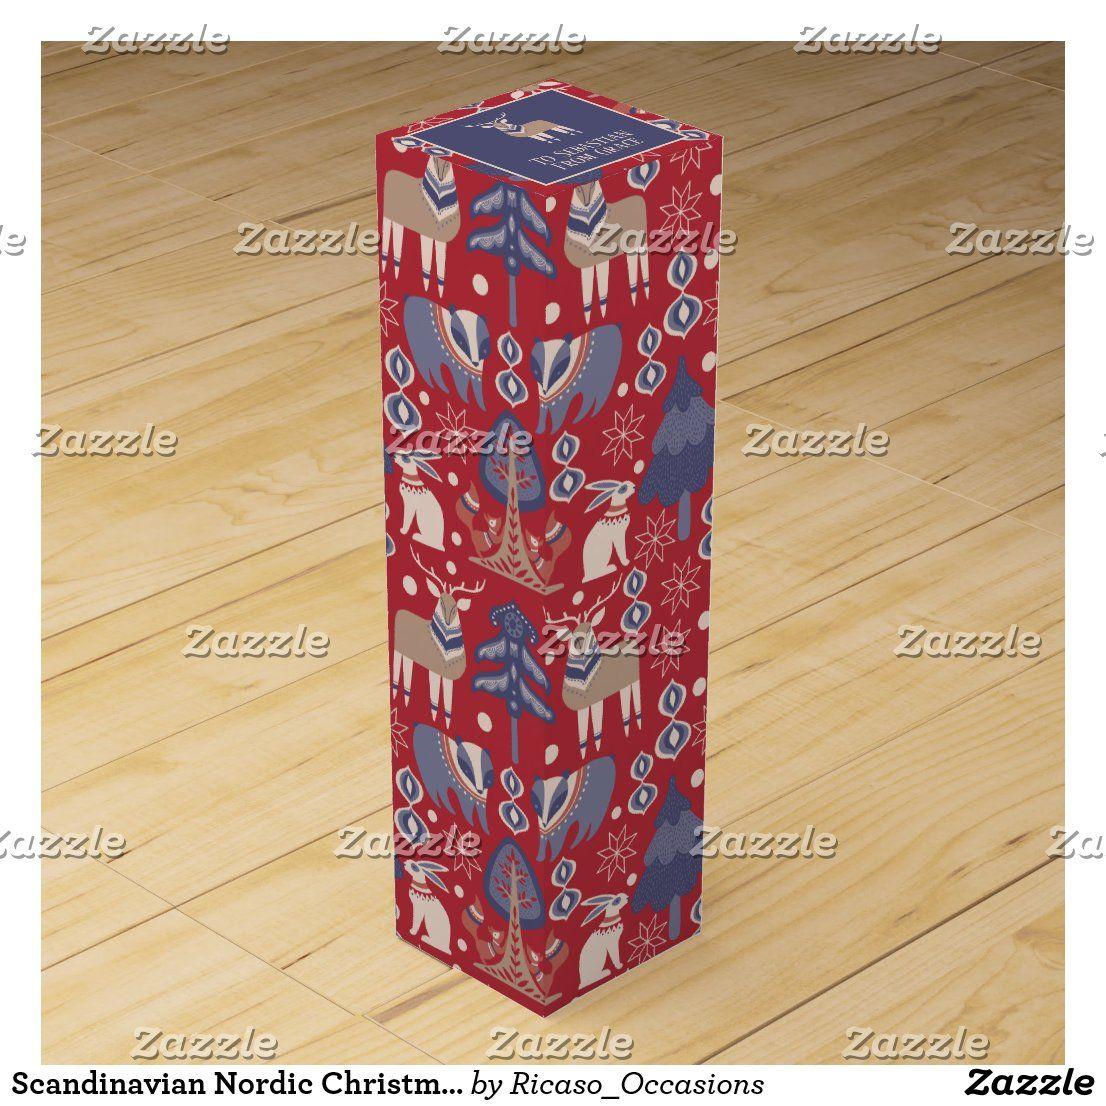 Scandinavian Nordic Christmas Personalized Wine Box In 2020 Personalized Wine Box Custom Wine Box Wine Box